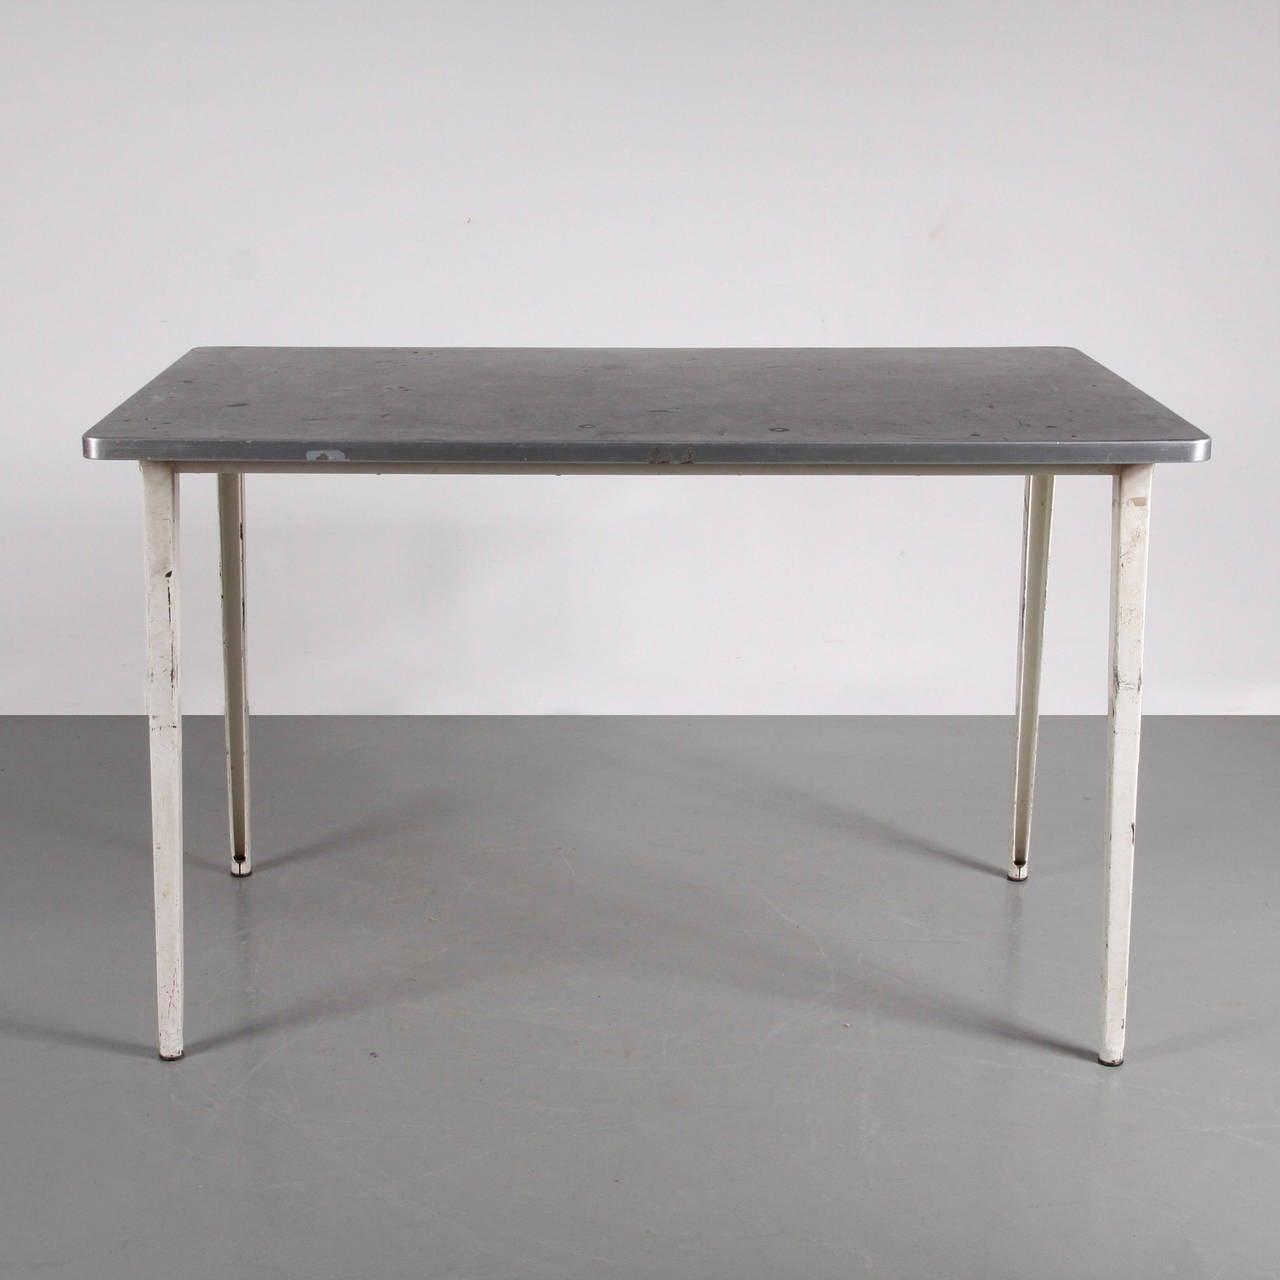 Table, model Reform, designed by Friso Kramer around 1950. Manufactured by De Cirkel (Netherlands) Enamelled folded sheet metal frame in excellent original condition.  Winner of the prestigious Signe D'Or award in 1960.  Literarure: Friso